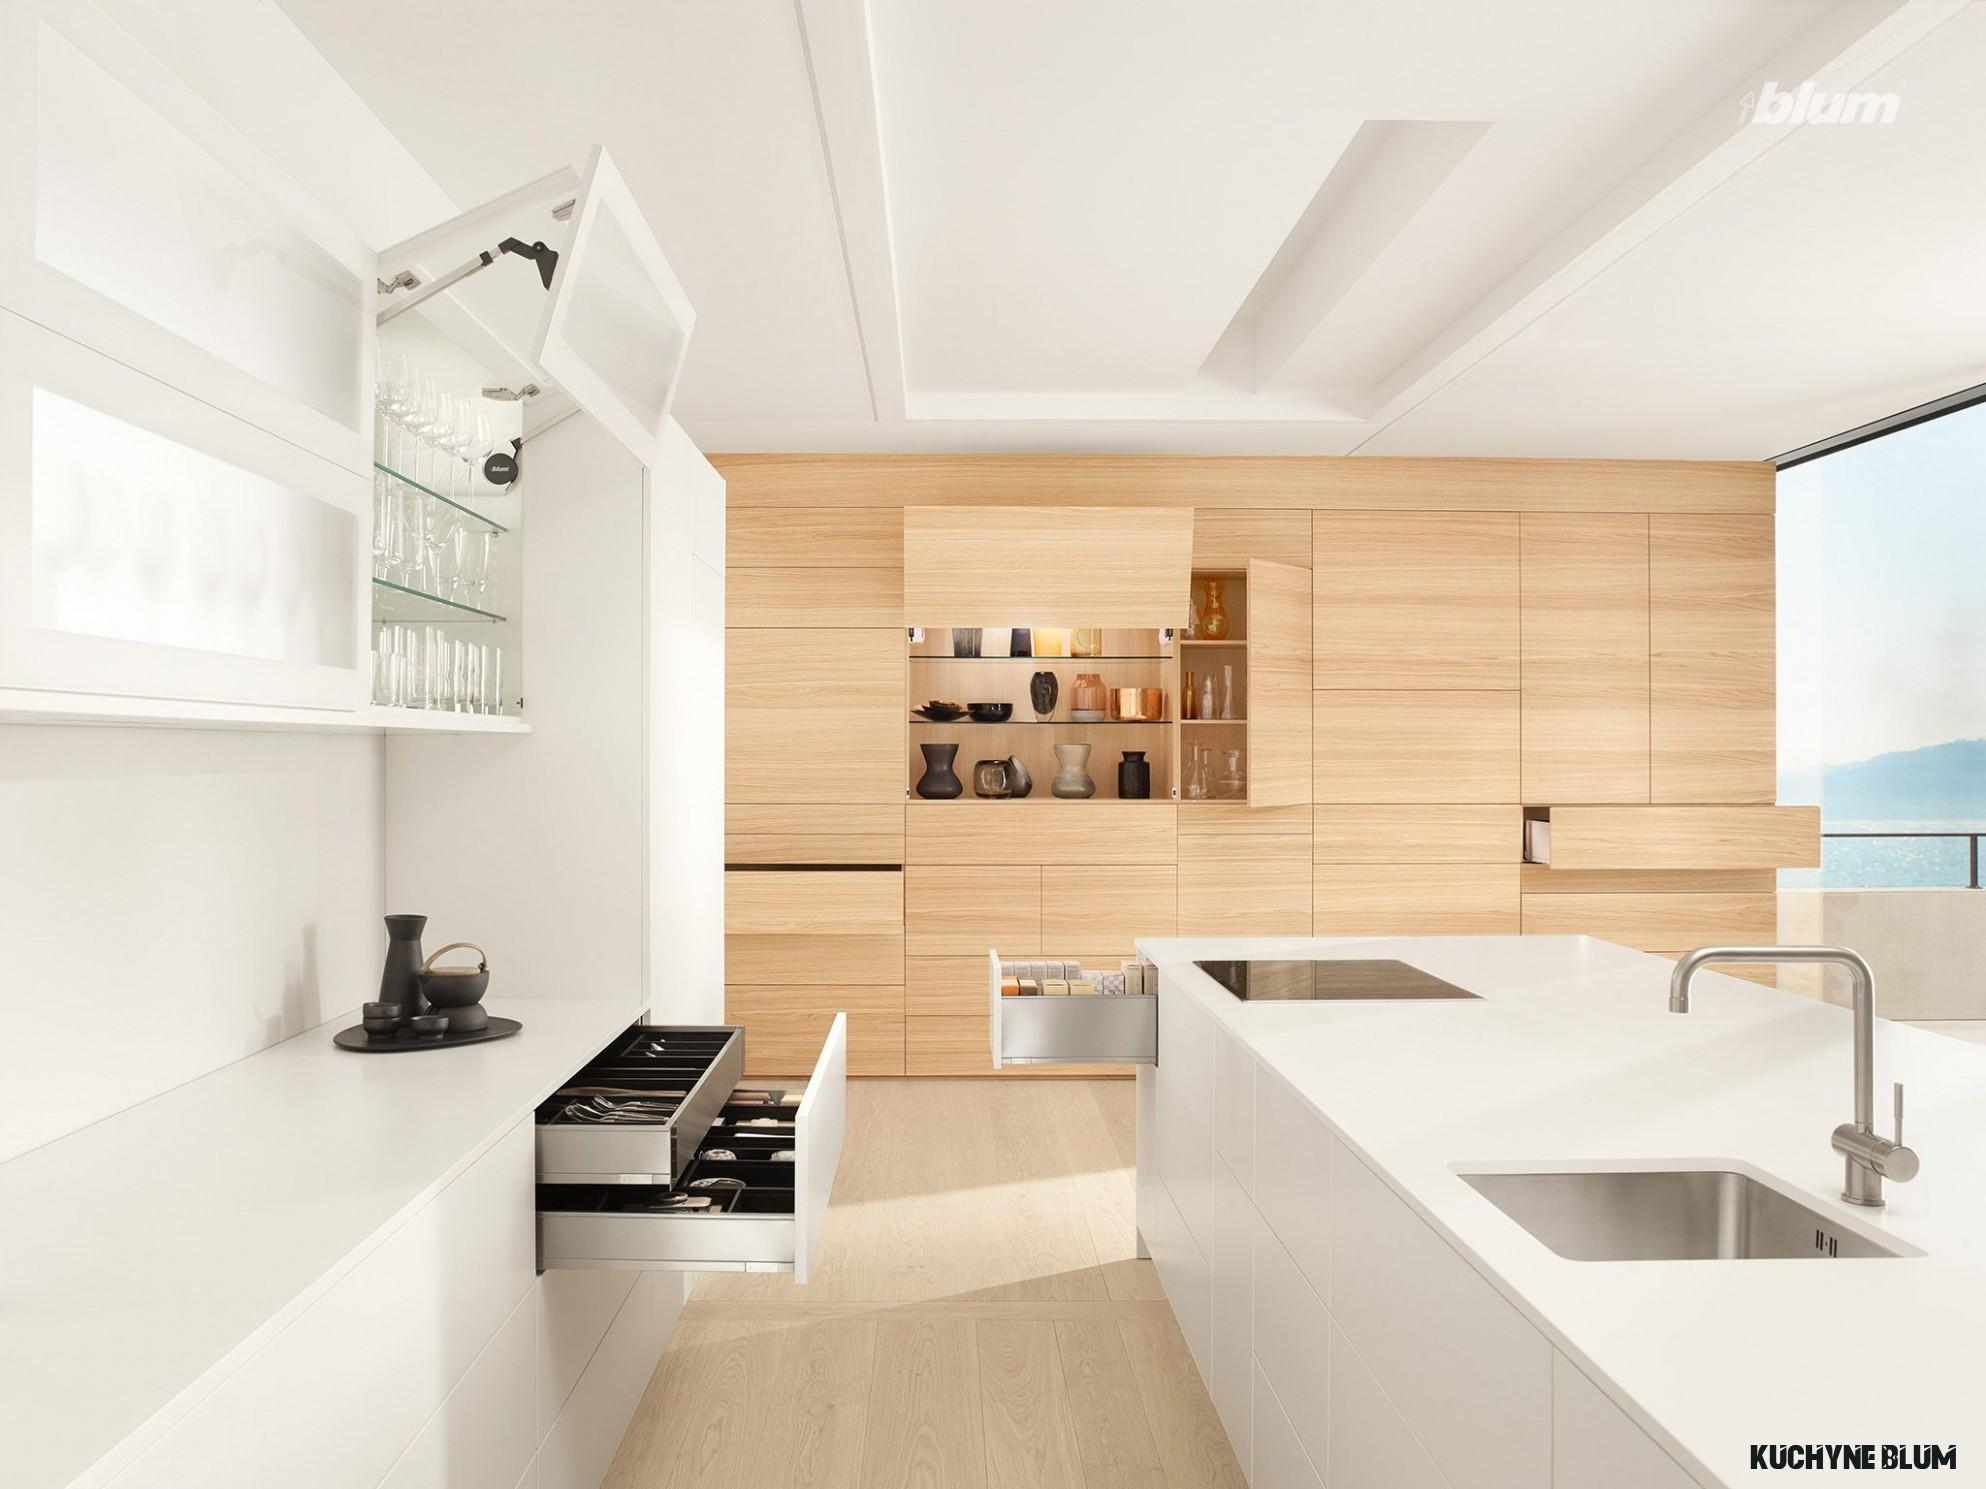 Minimalist, Scandinavian-style kitchen  Kitchen drawers, Buy